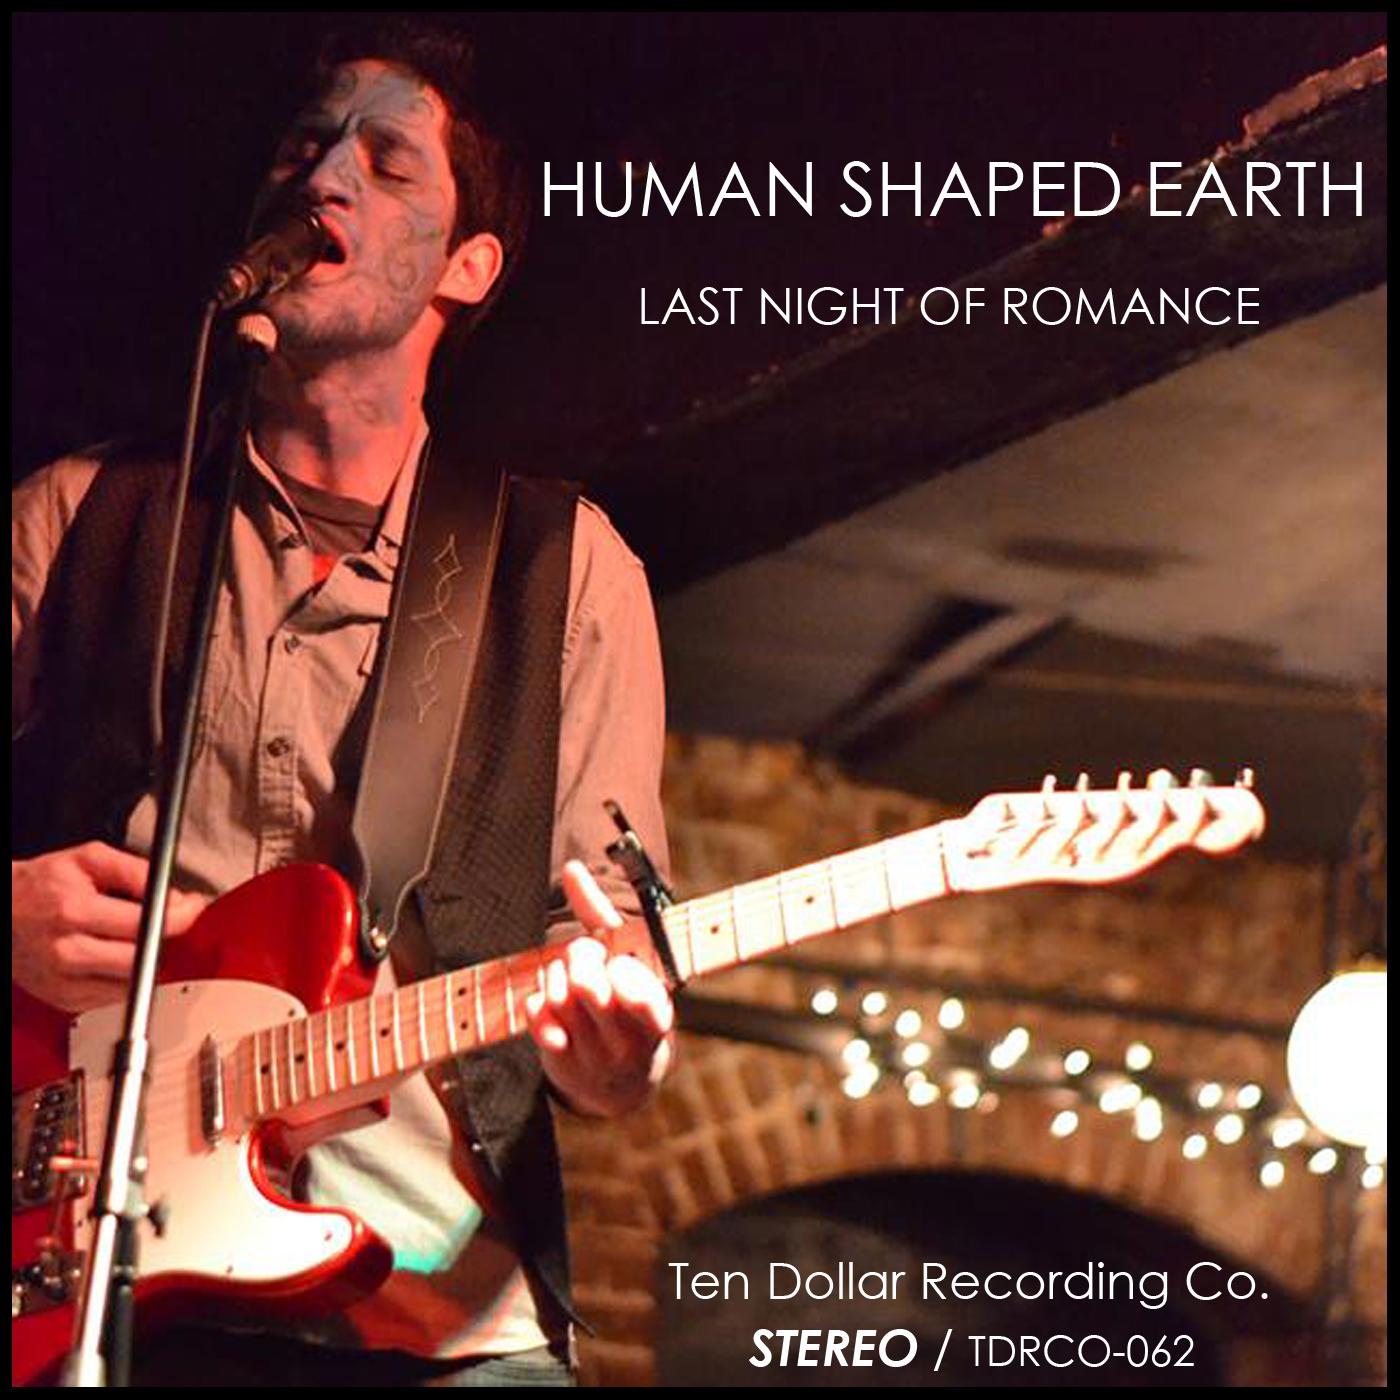 Human Shaped Earth - Last Night of Romance (Single)